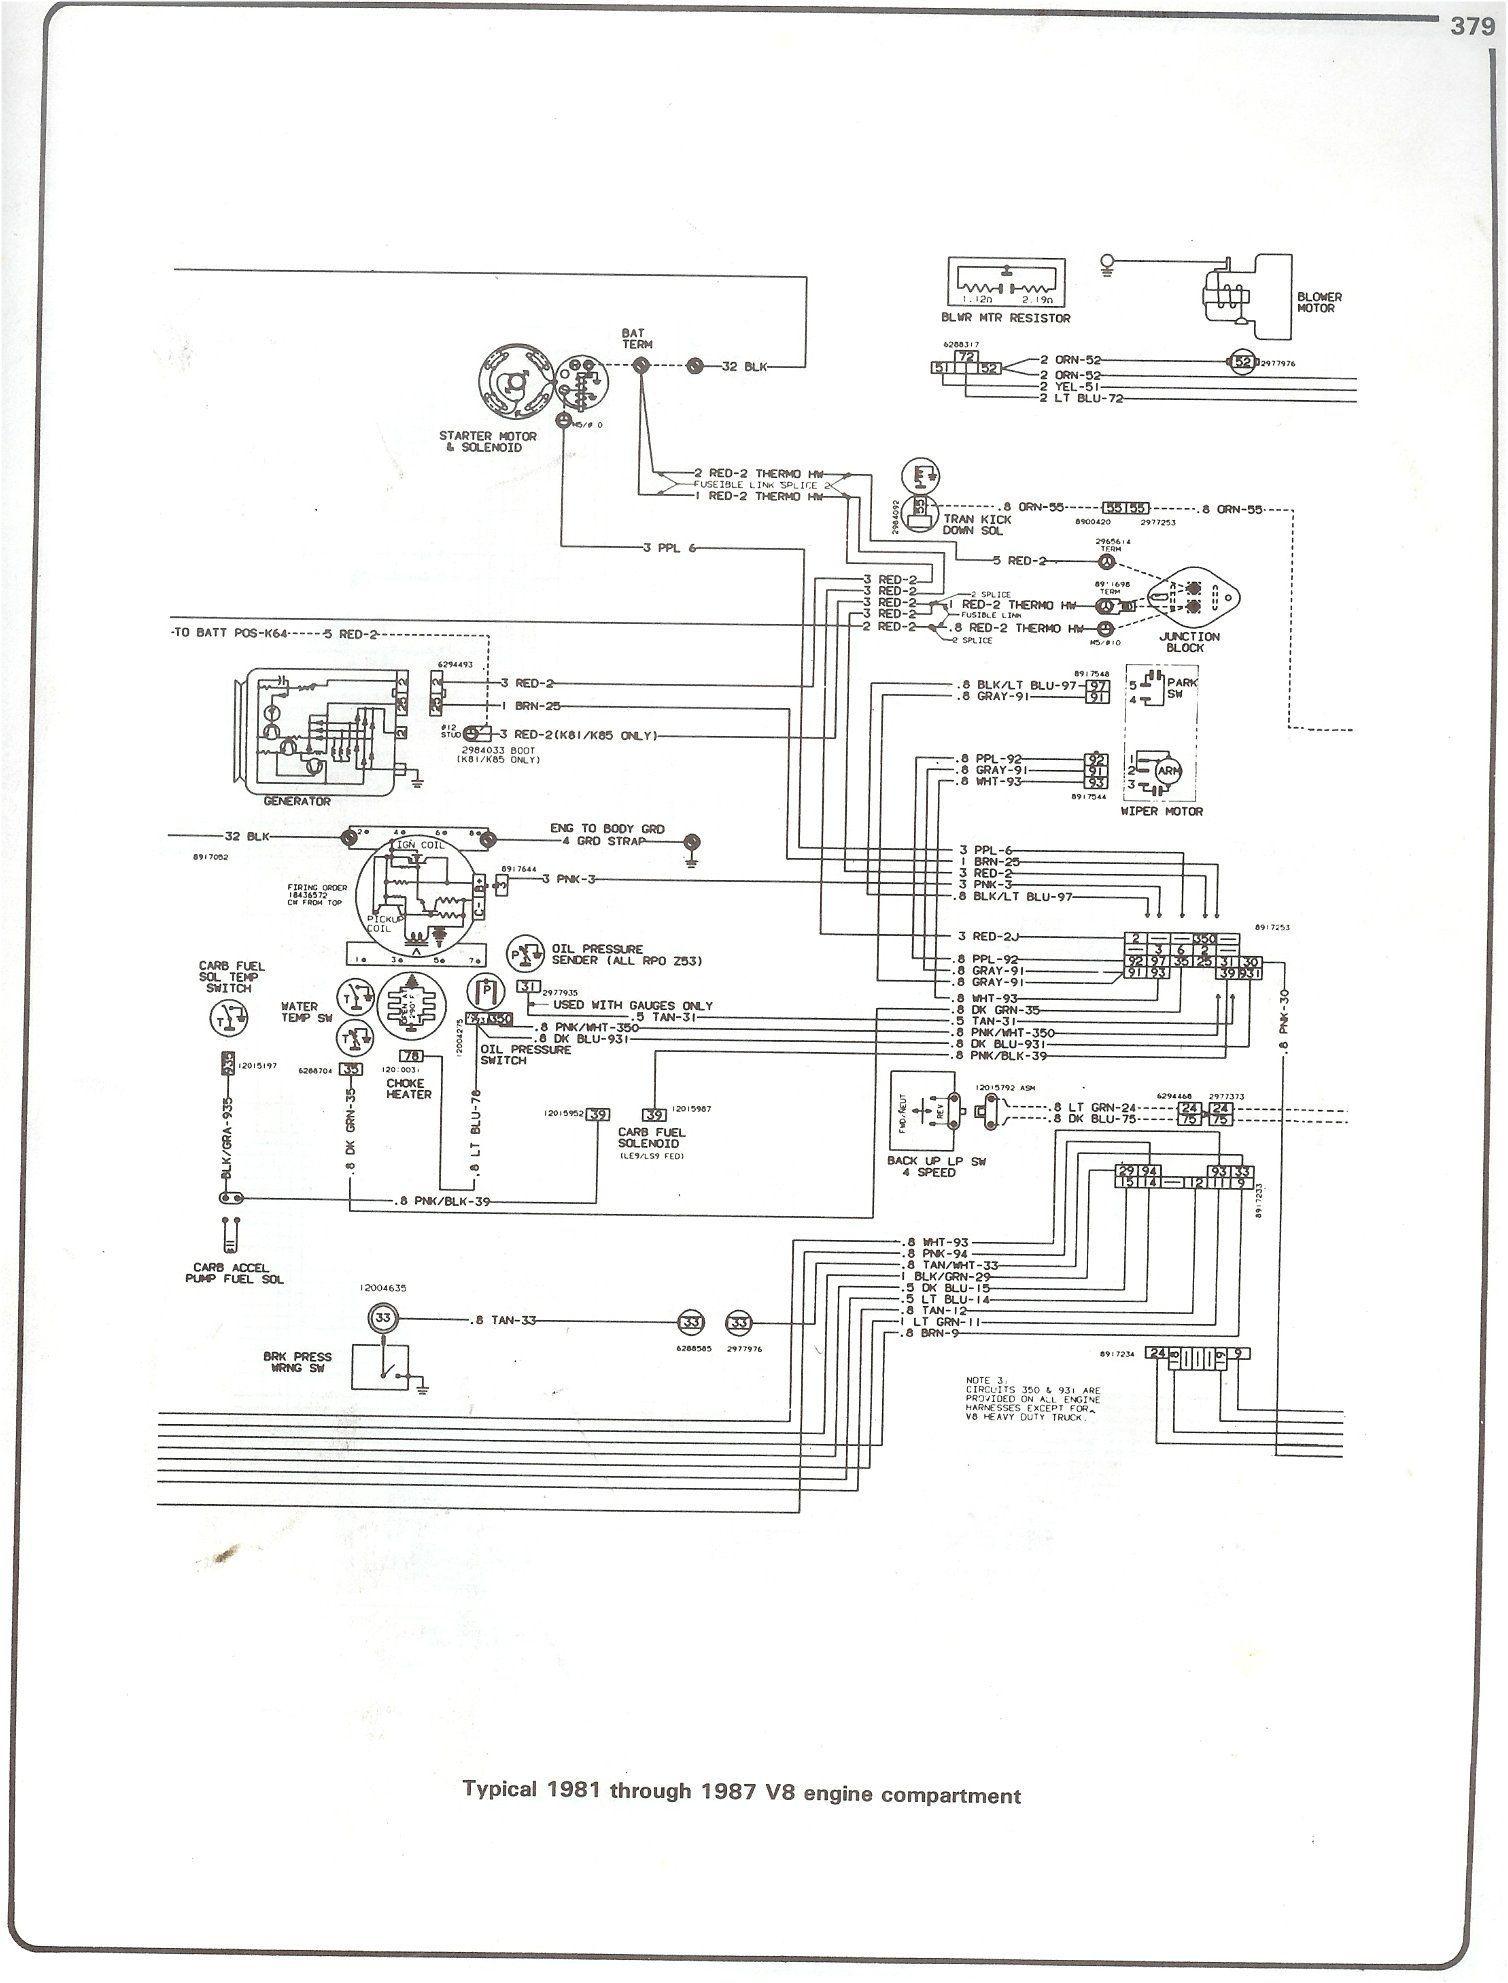 Chevy 1500 Fuel Pump Wiring in 2020 Chevy trucks, 1979